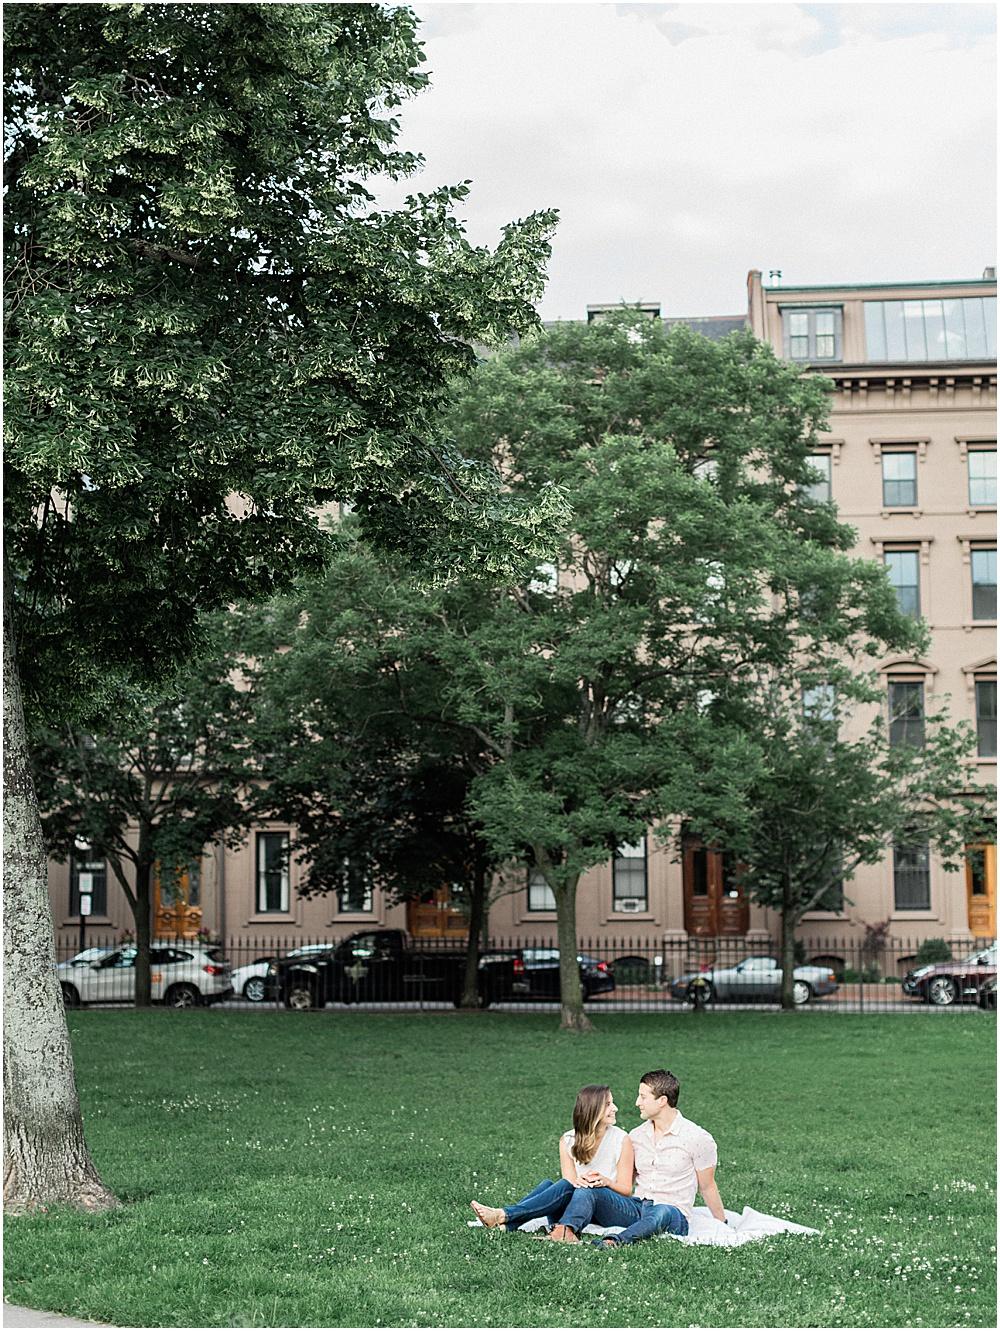 south_end_m_flynn_showroom_ring_oval_engagement_session_massachusetts_boston_wedding_photographer_meredith_jane_photography_photo_0469.jpg